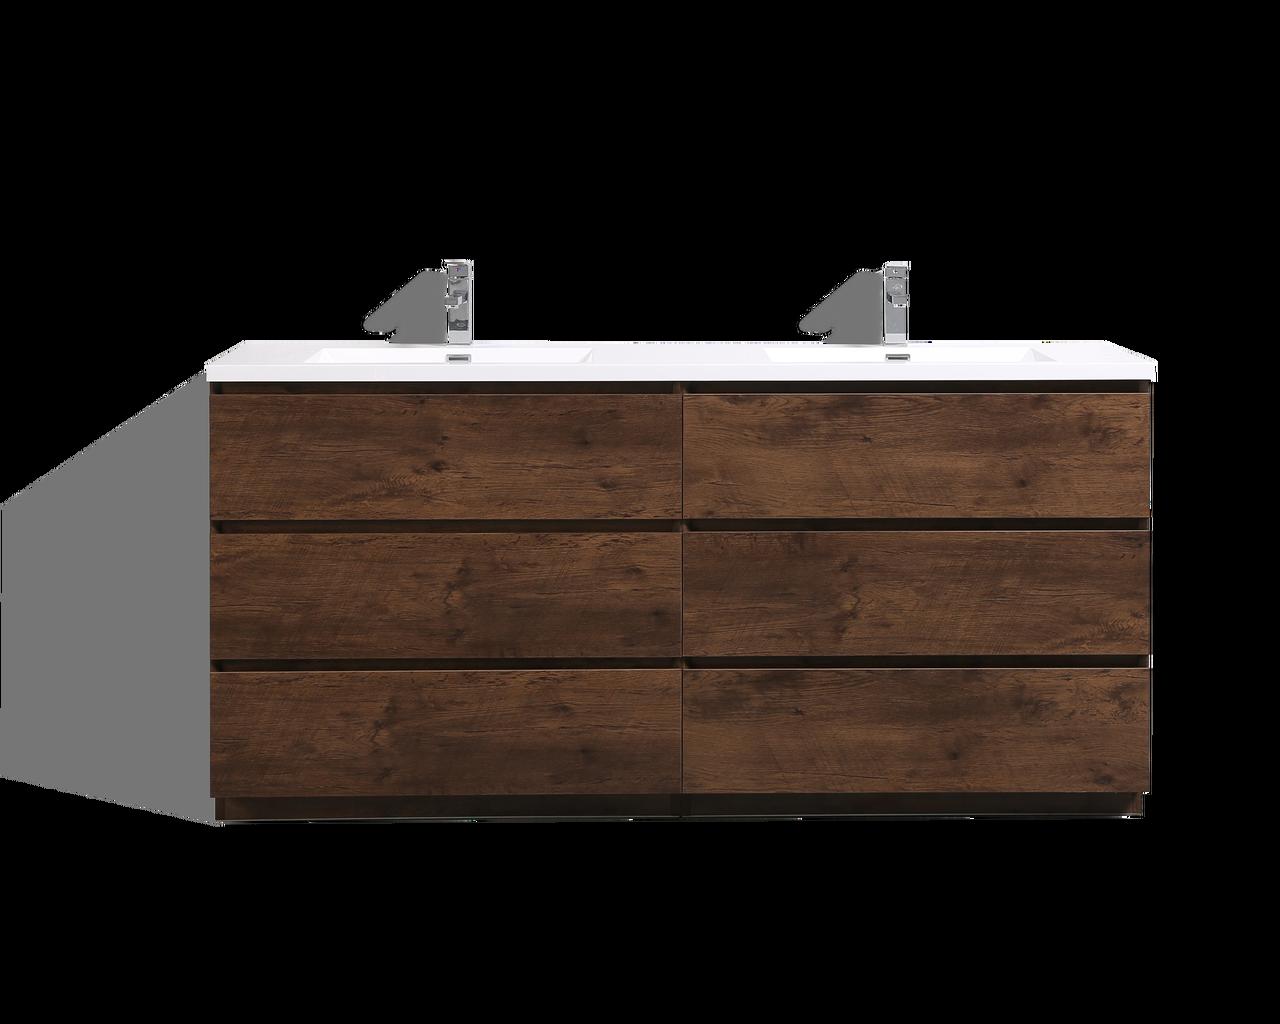 moa 72 u2033 double sink rosewood modern bathroom vanity w 6 drawers and rh vanityoutlets com 72 double sink bathroom vanity cabinet 72 inch double sink bathroom vanities